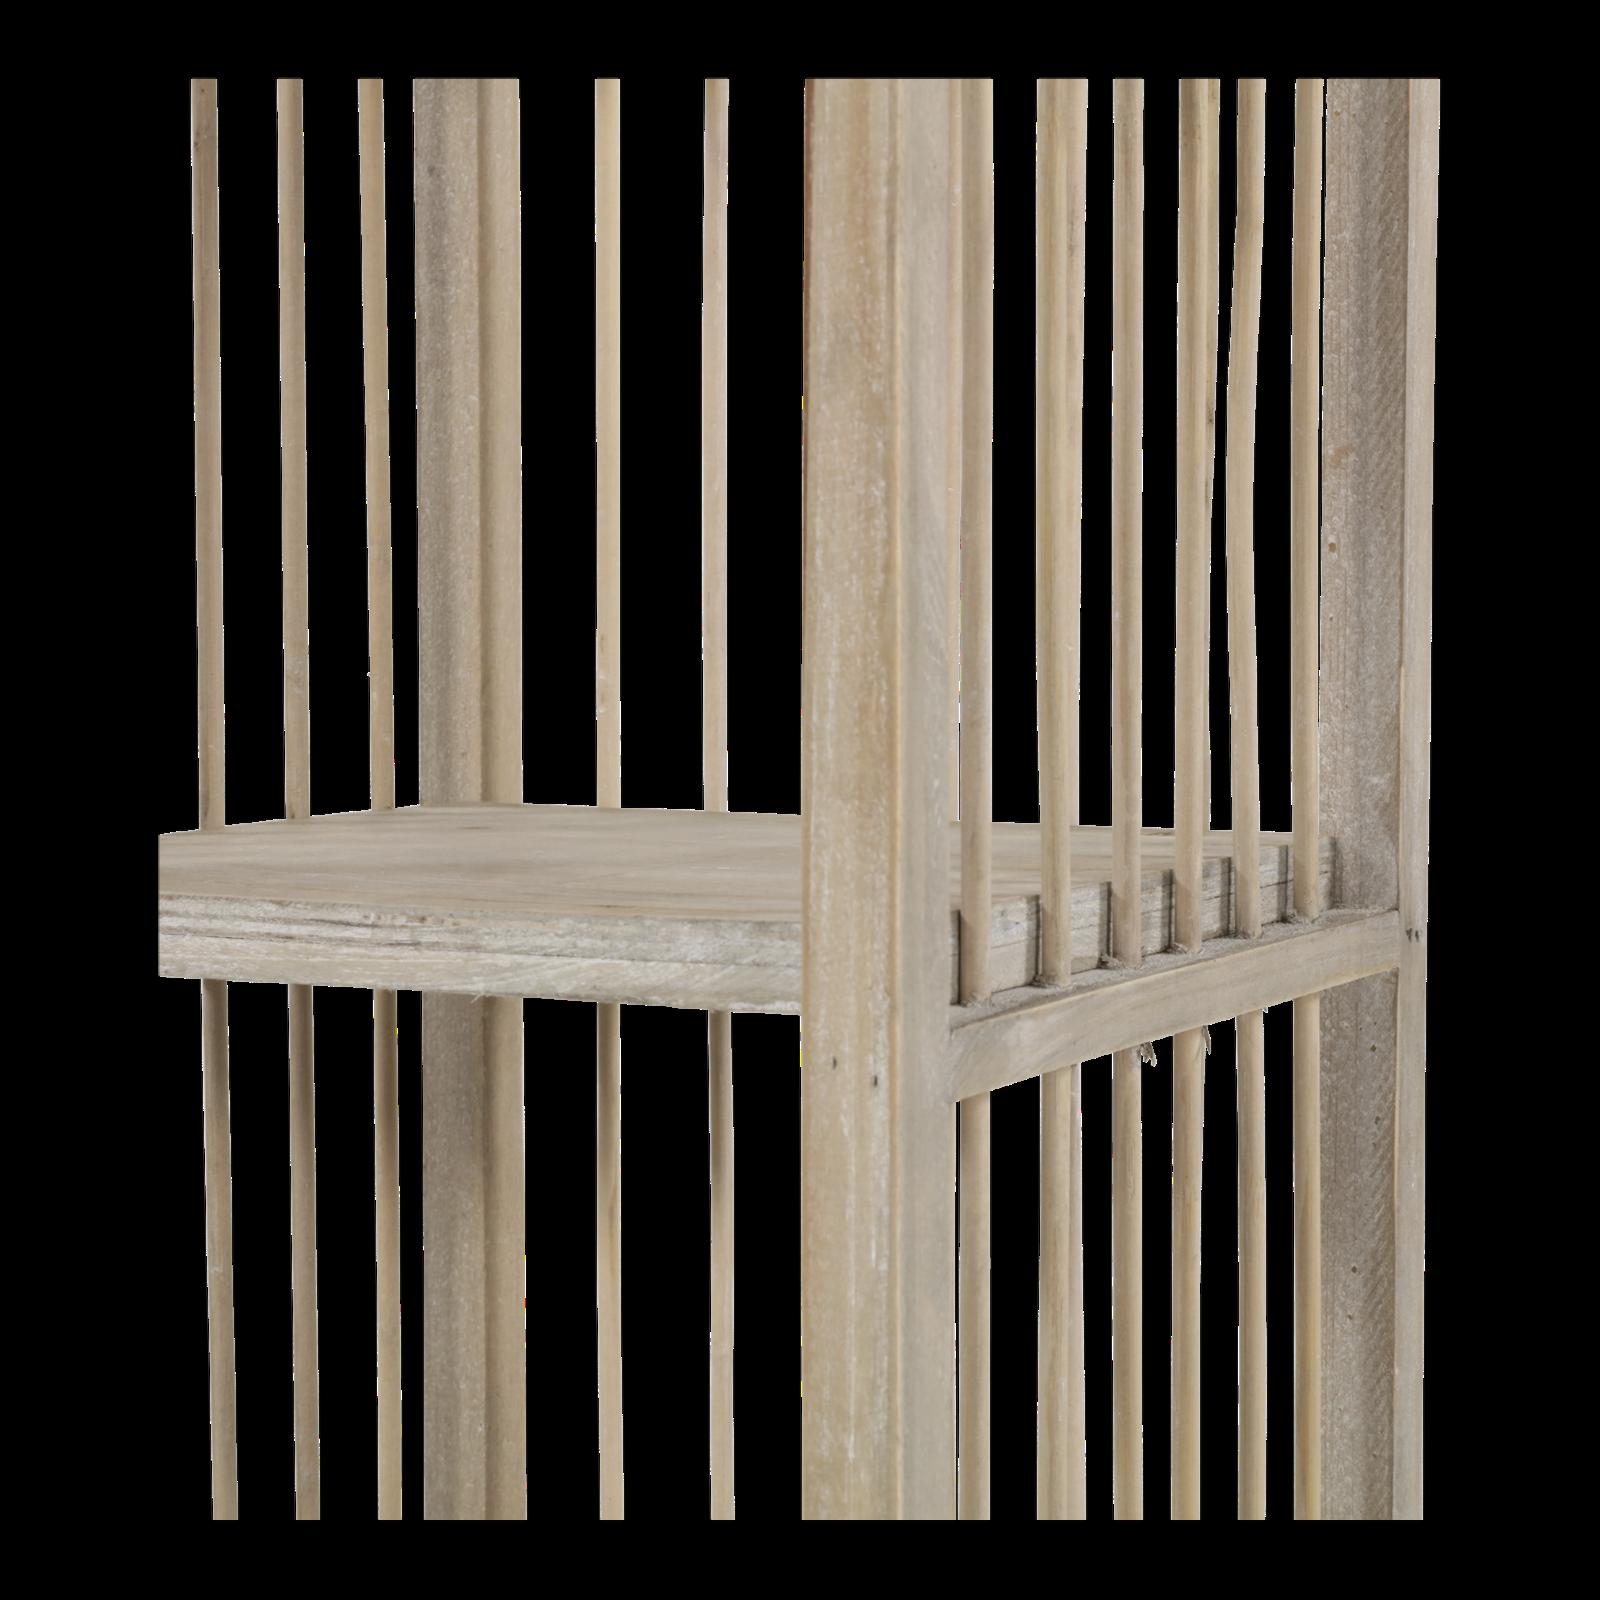 Full Size of Gartenregal Holz Etagere Stufengestell Schrank Regal Pflanztreppe 2er Set Massivholz Schlafzimmer Esstisch Holzplatte Holzhäuser Garten Bett 180x200 Komplett Wohnzimmer Gartenregal Holz